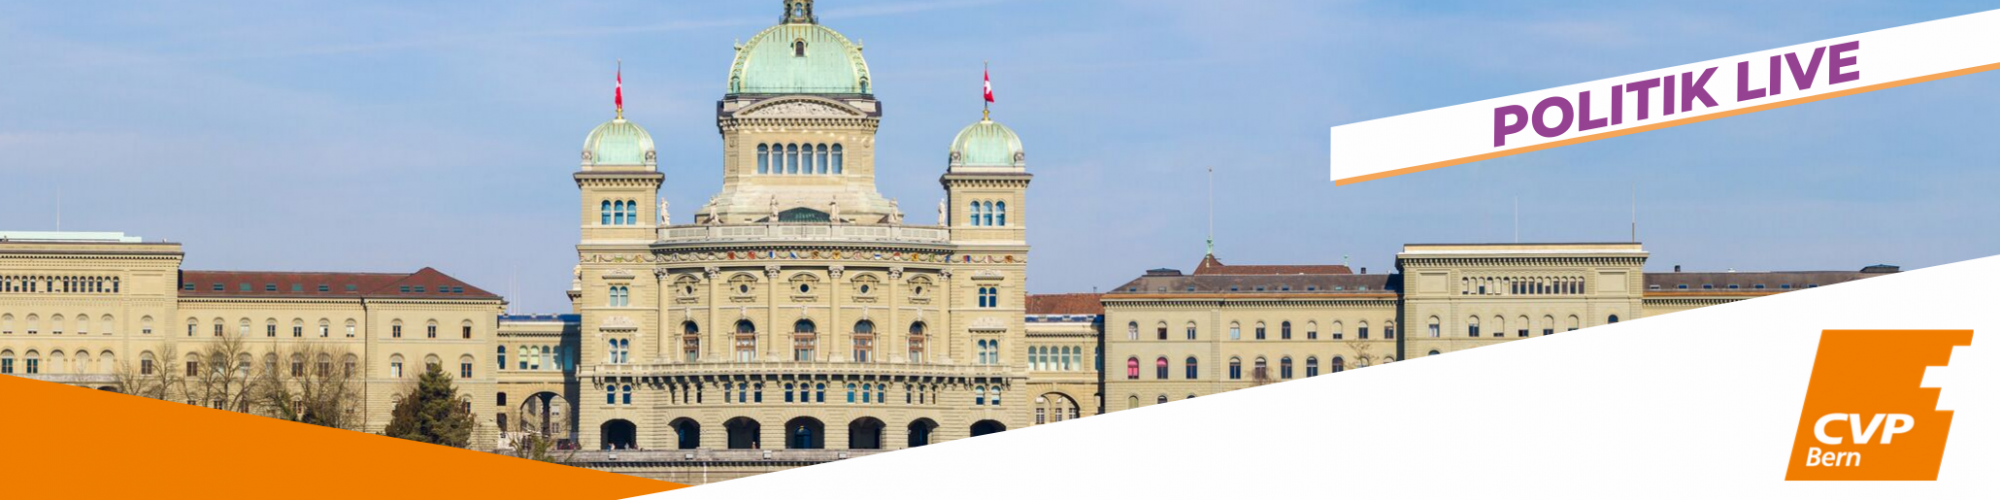 CVP Kanton Bern